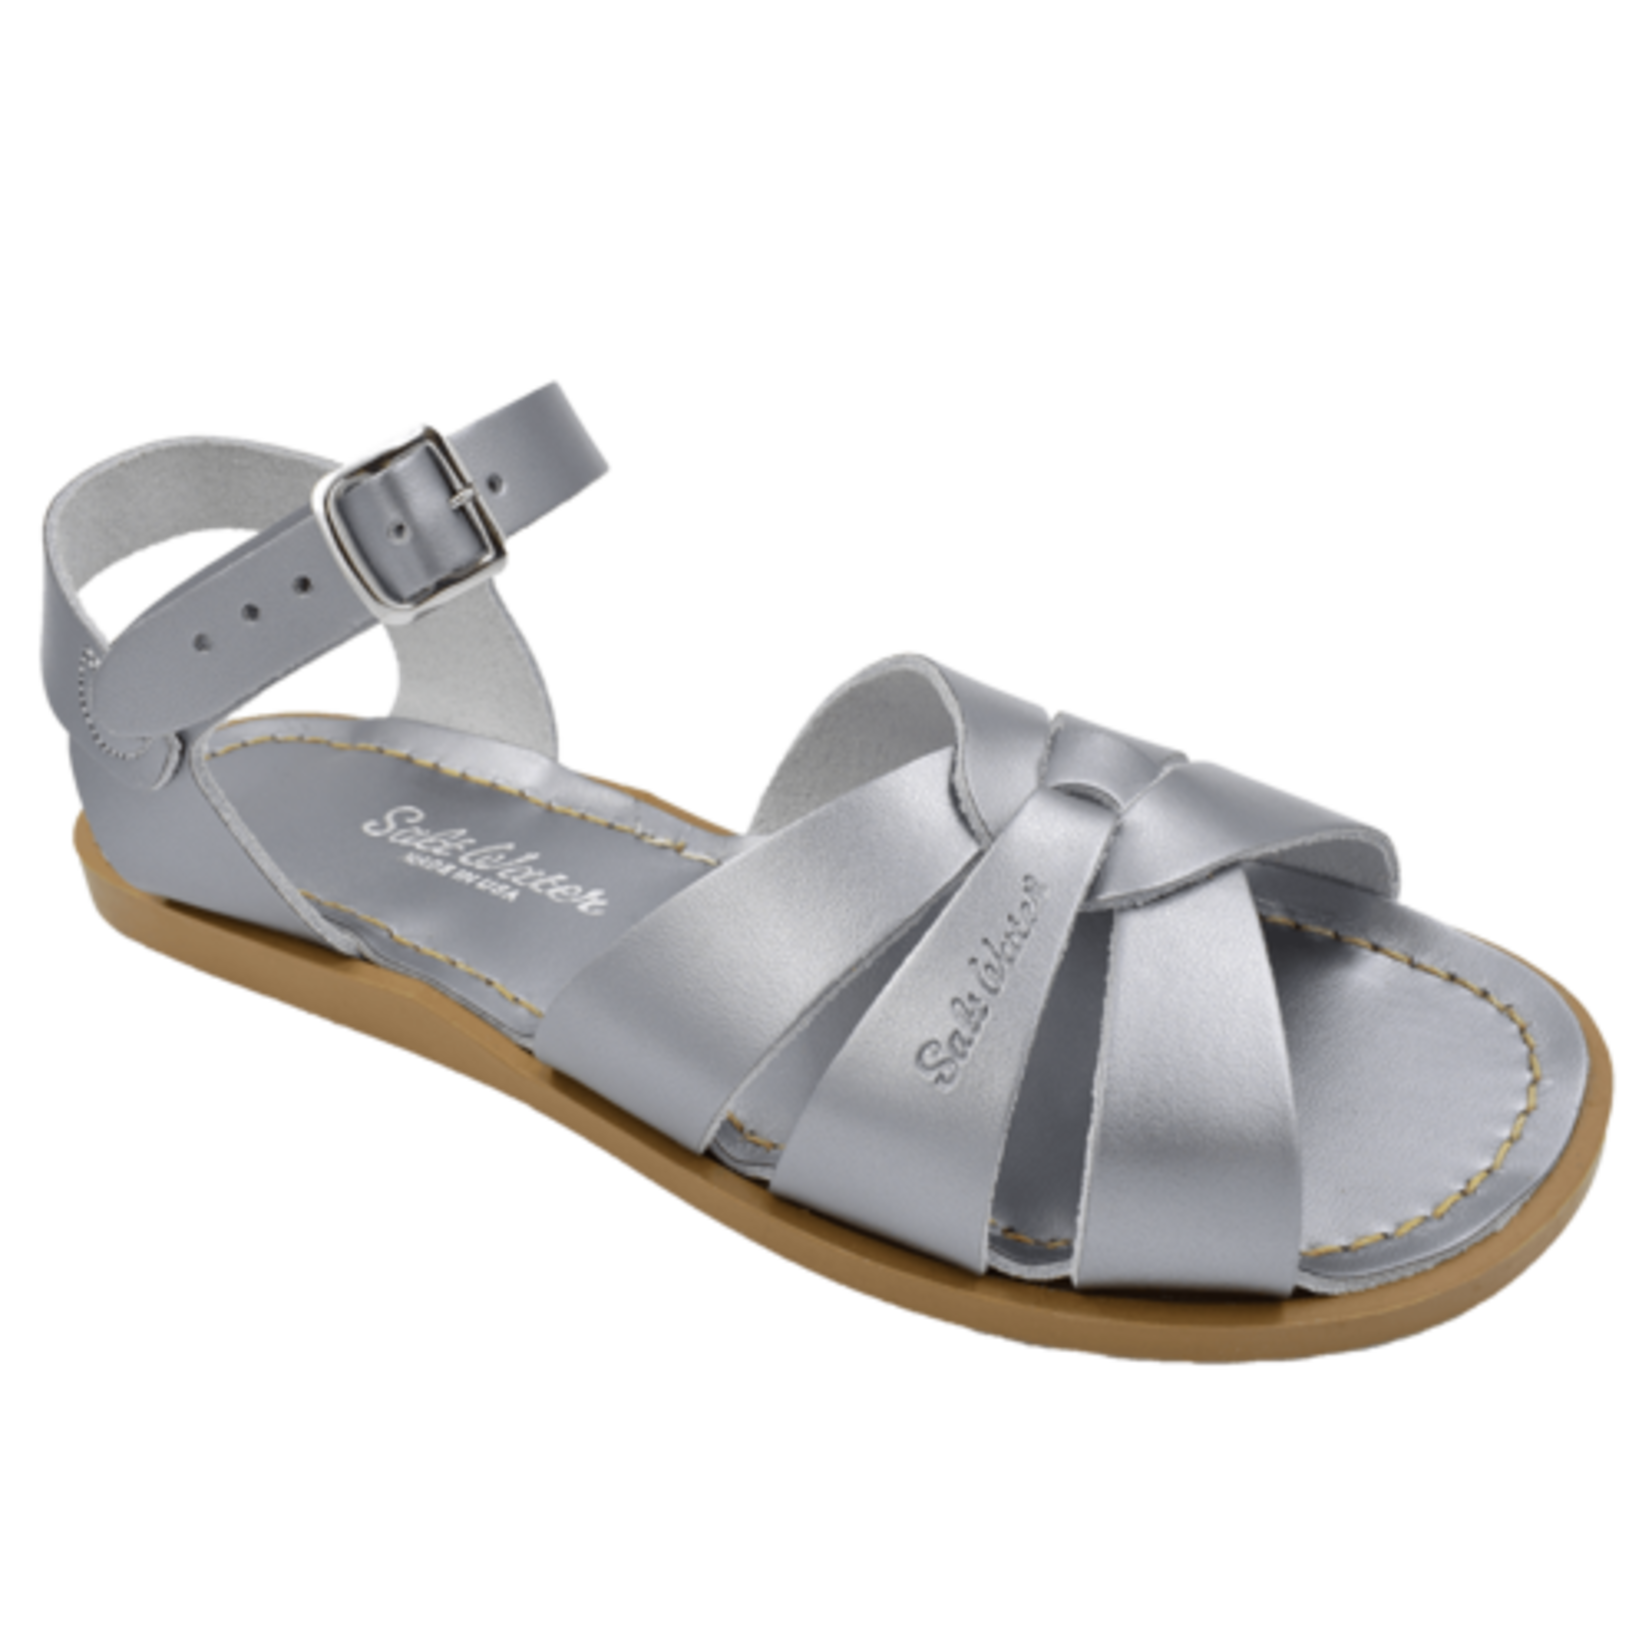 Hoy Shoe Co. Salt Water Sandals Pewter